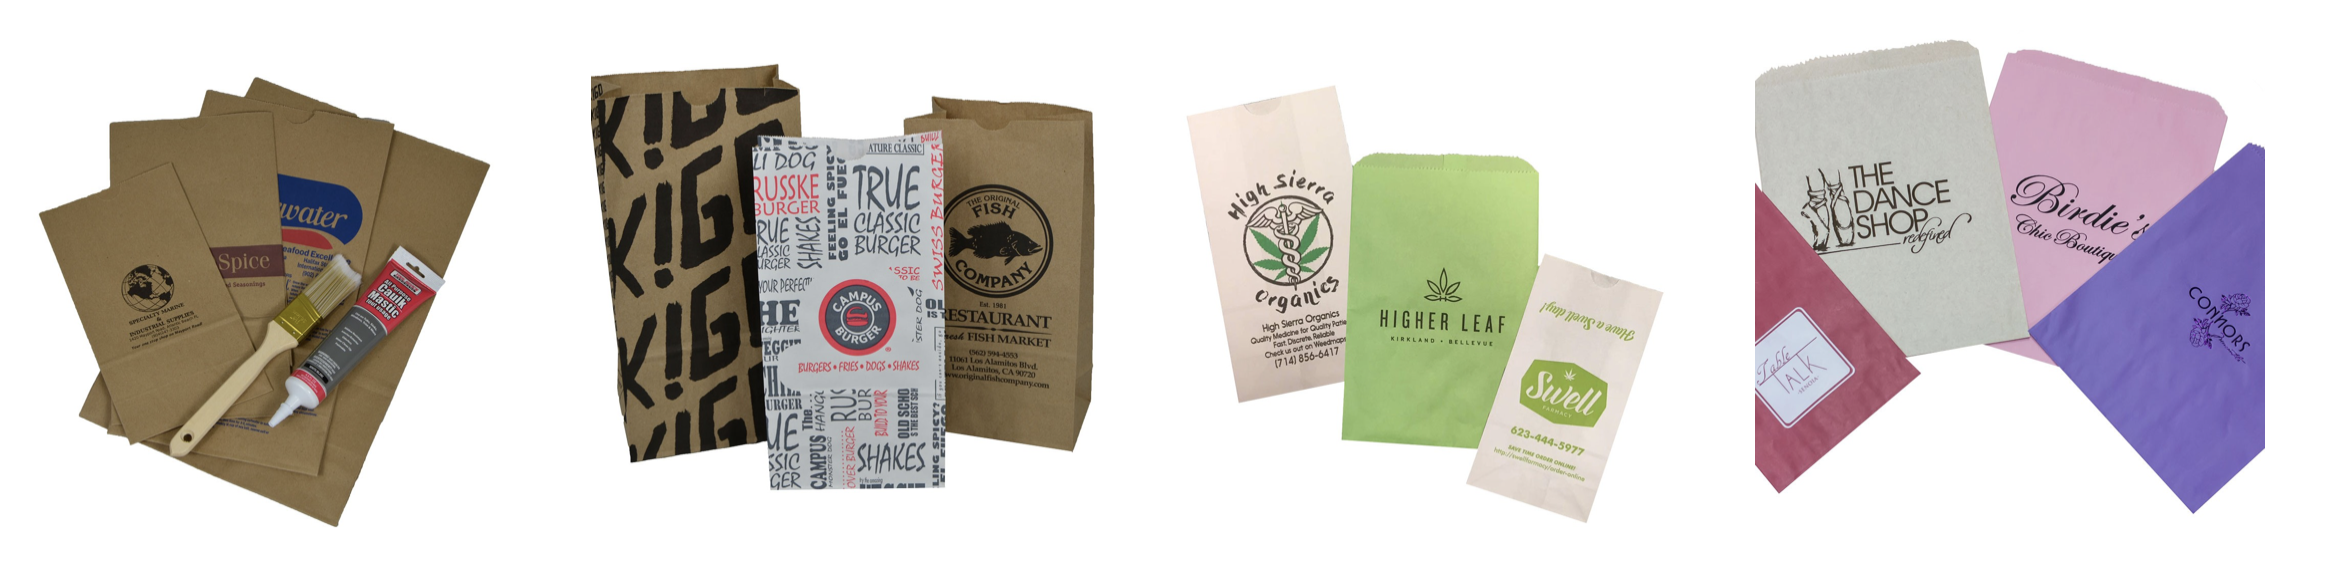 Paper Dispensary Shop Bags Merchandise